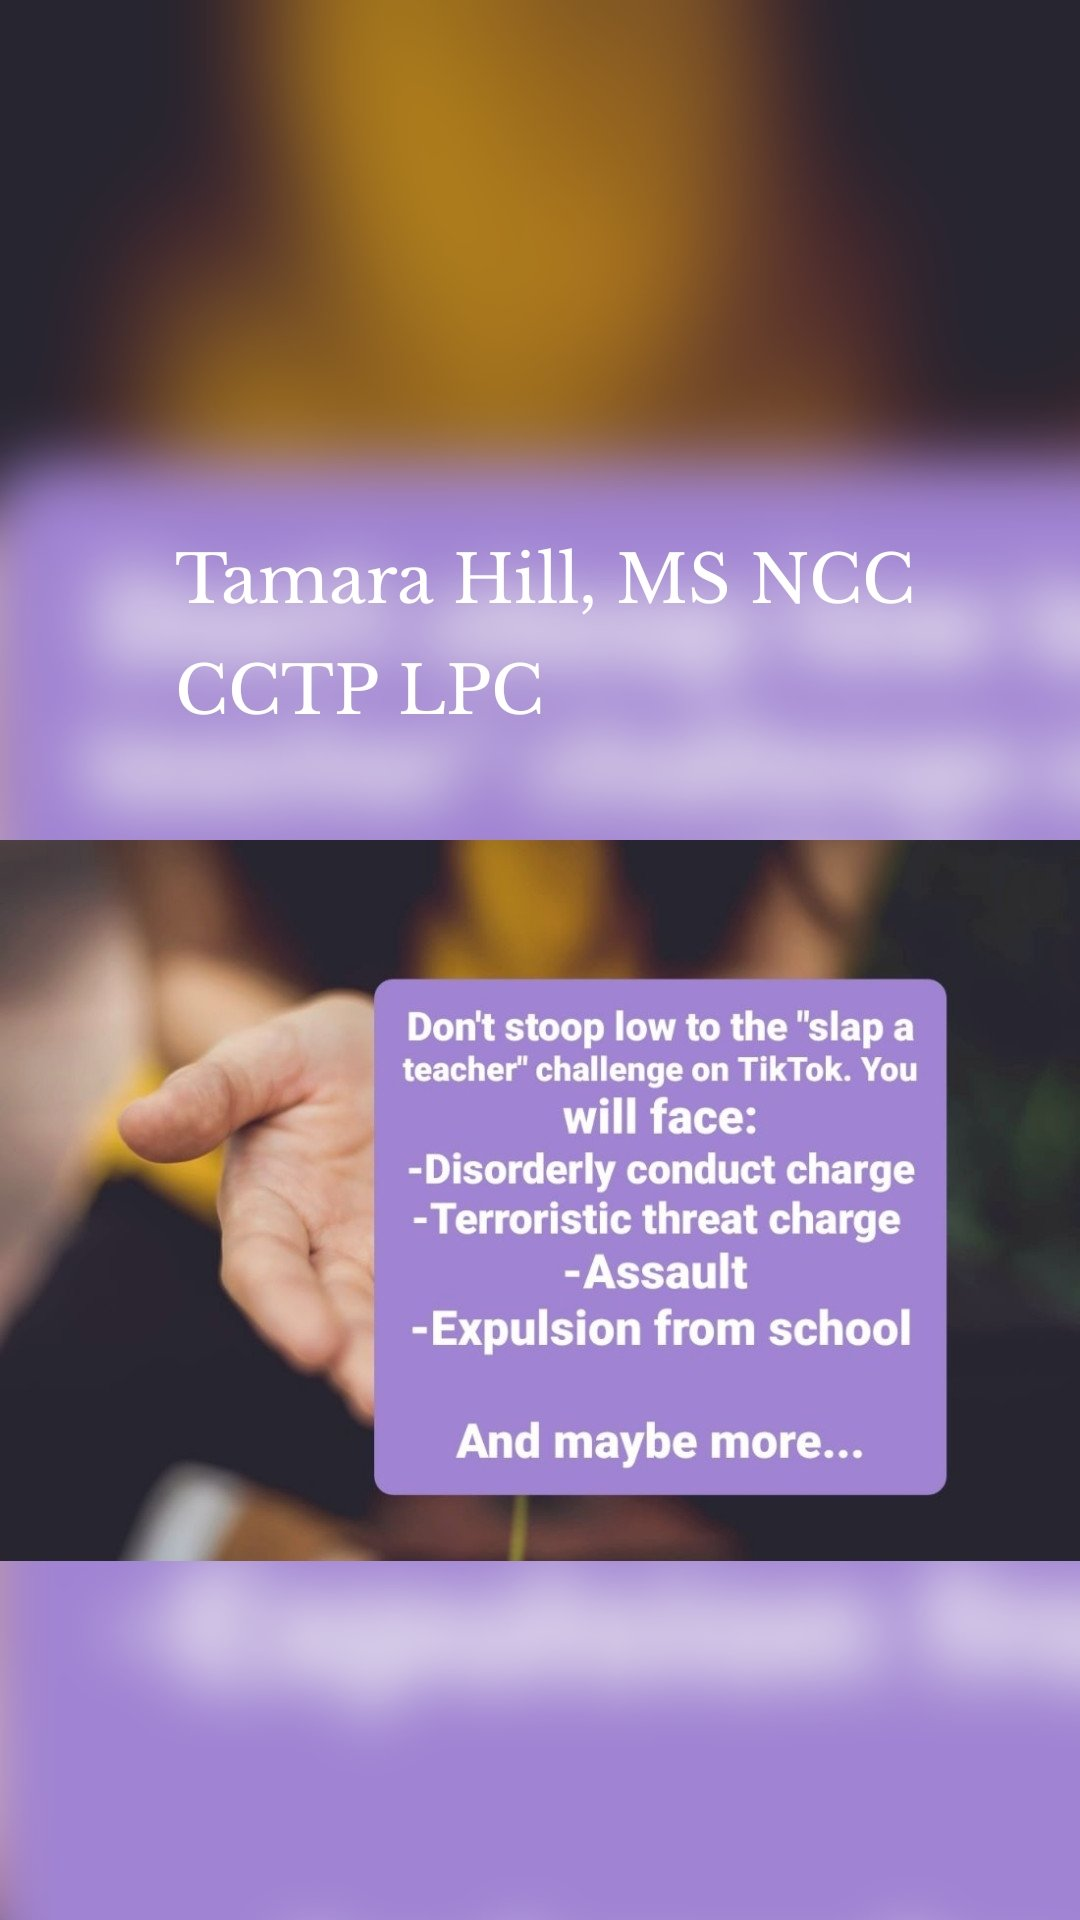 Tamara Hill, MS NCC CCTP LPC